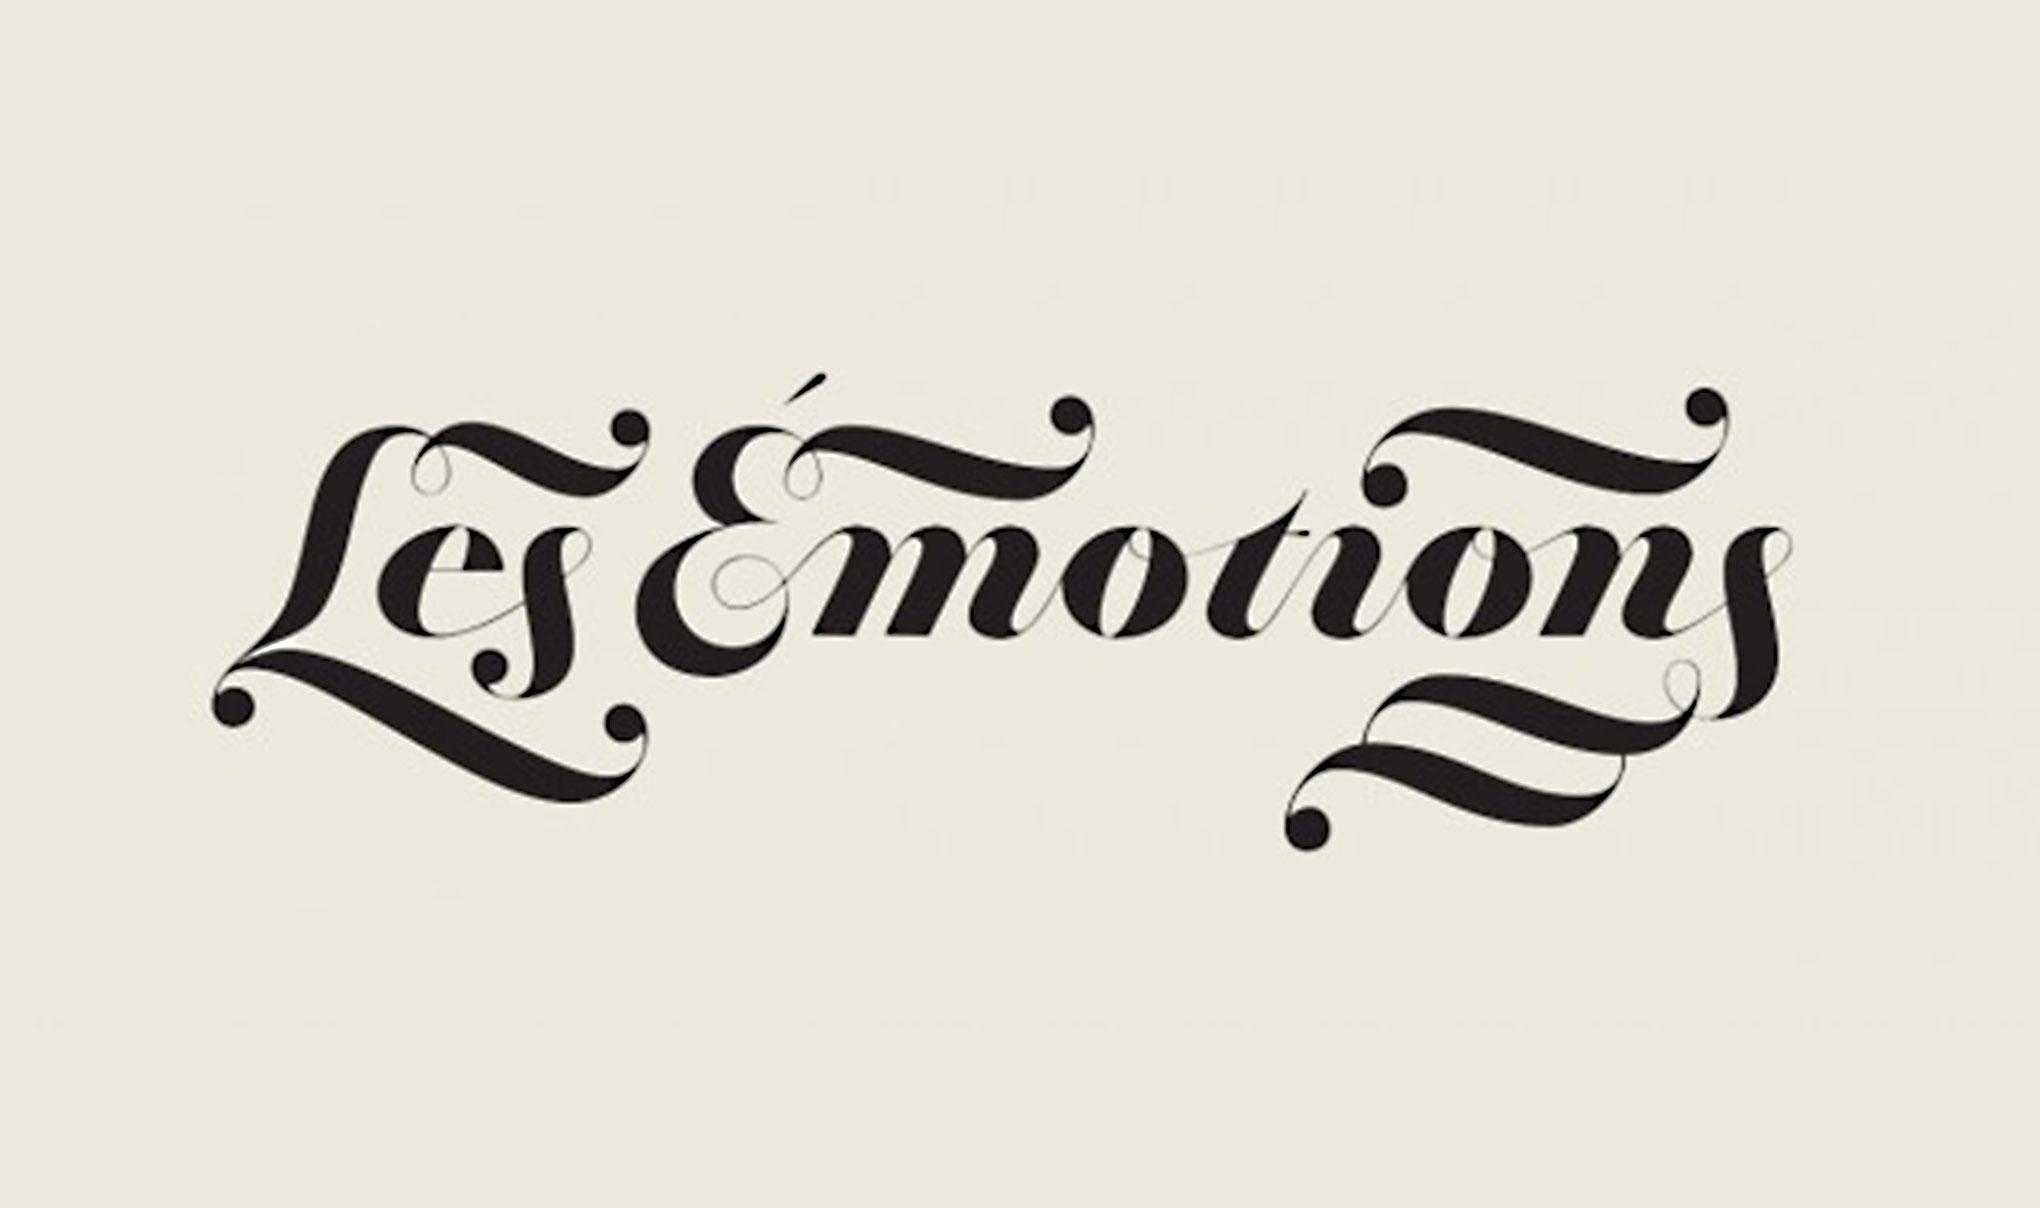 Black text ' Les Emotions' Featured image for blog 'Packaging Design, Let's Get Emotional'